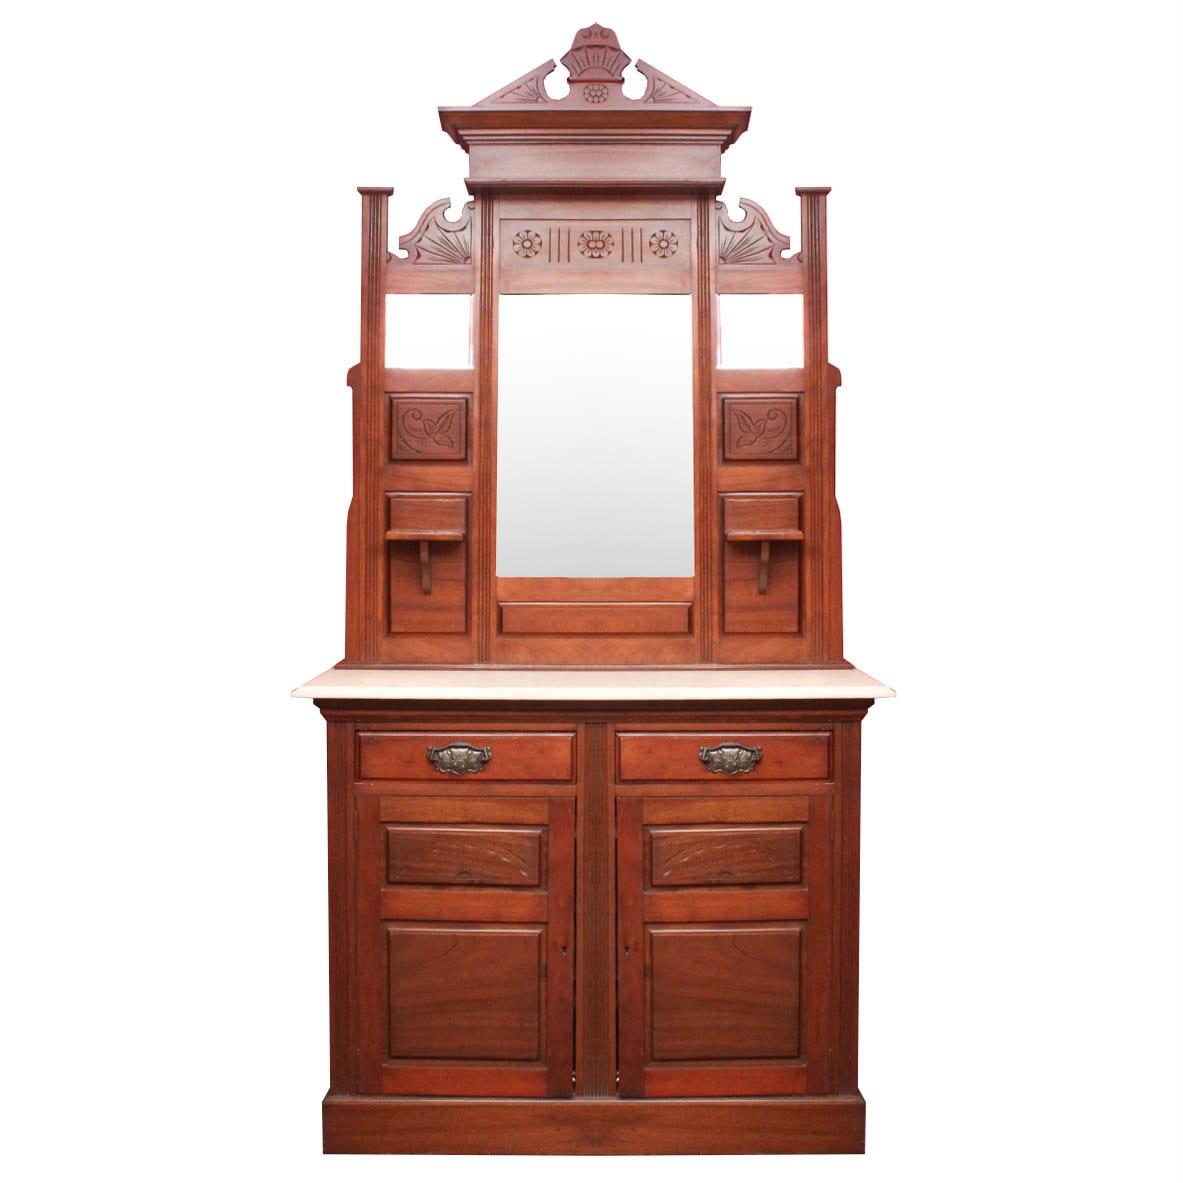 Antique Eastlake Dresser with Marble Top